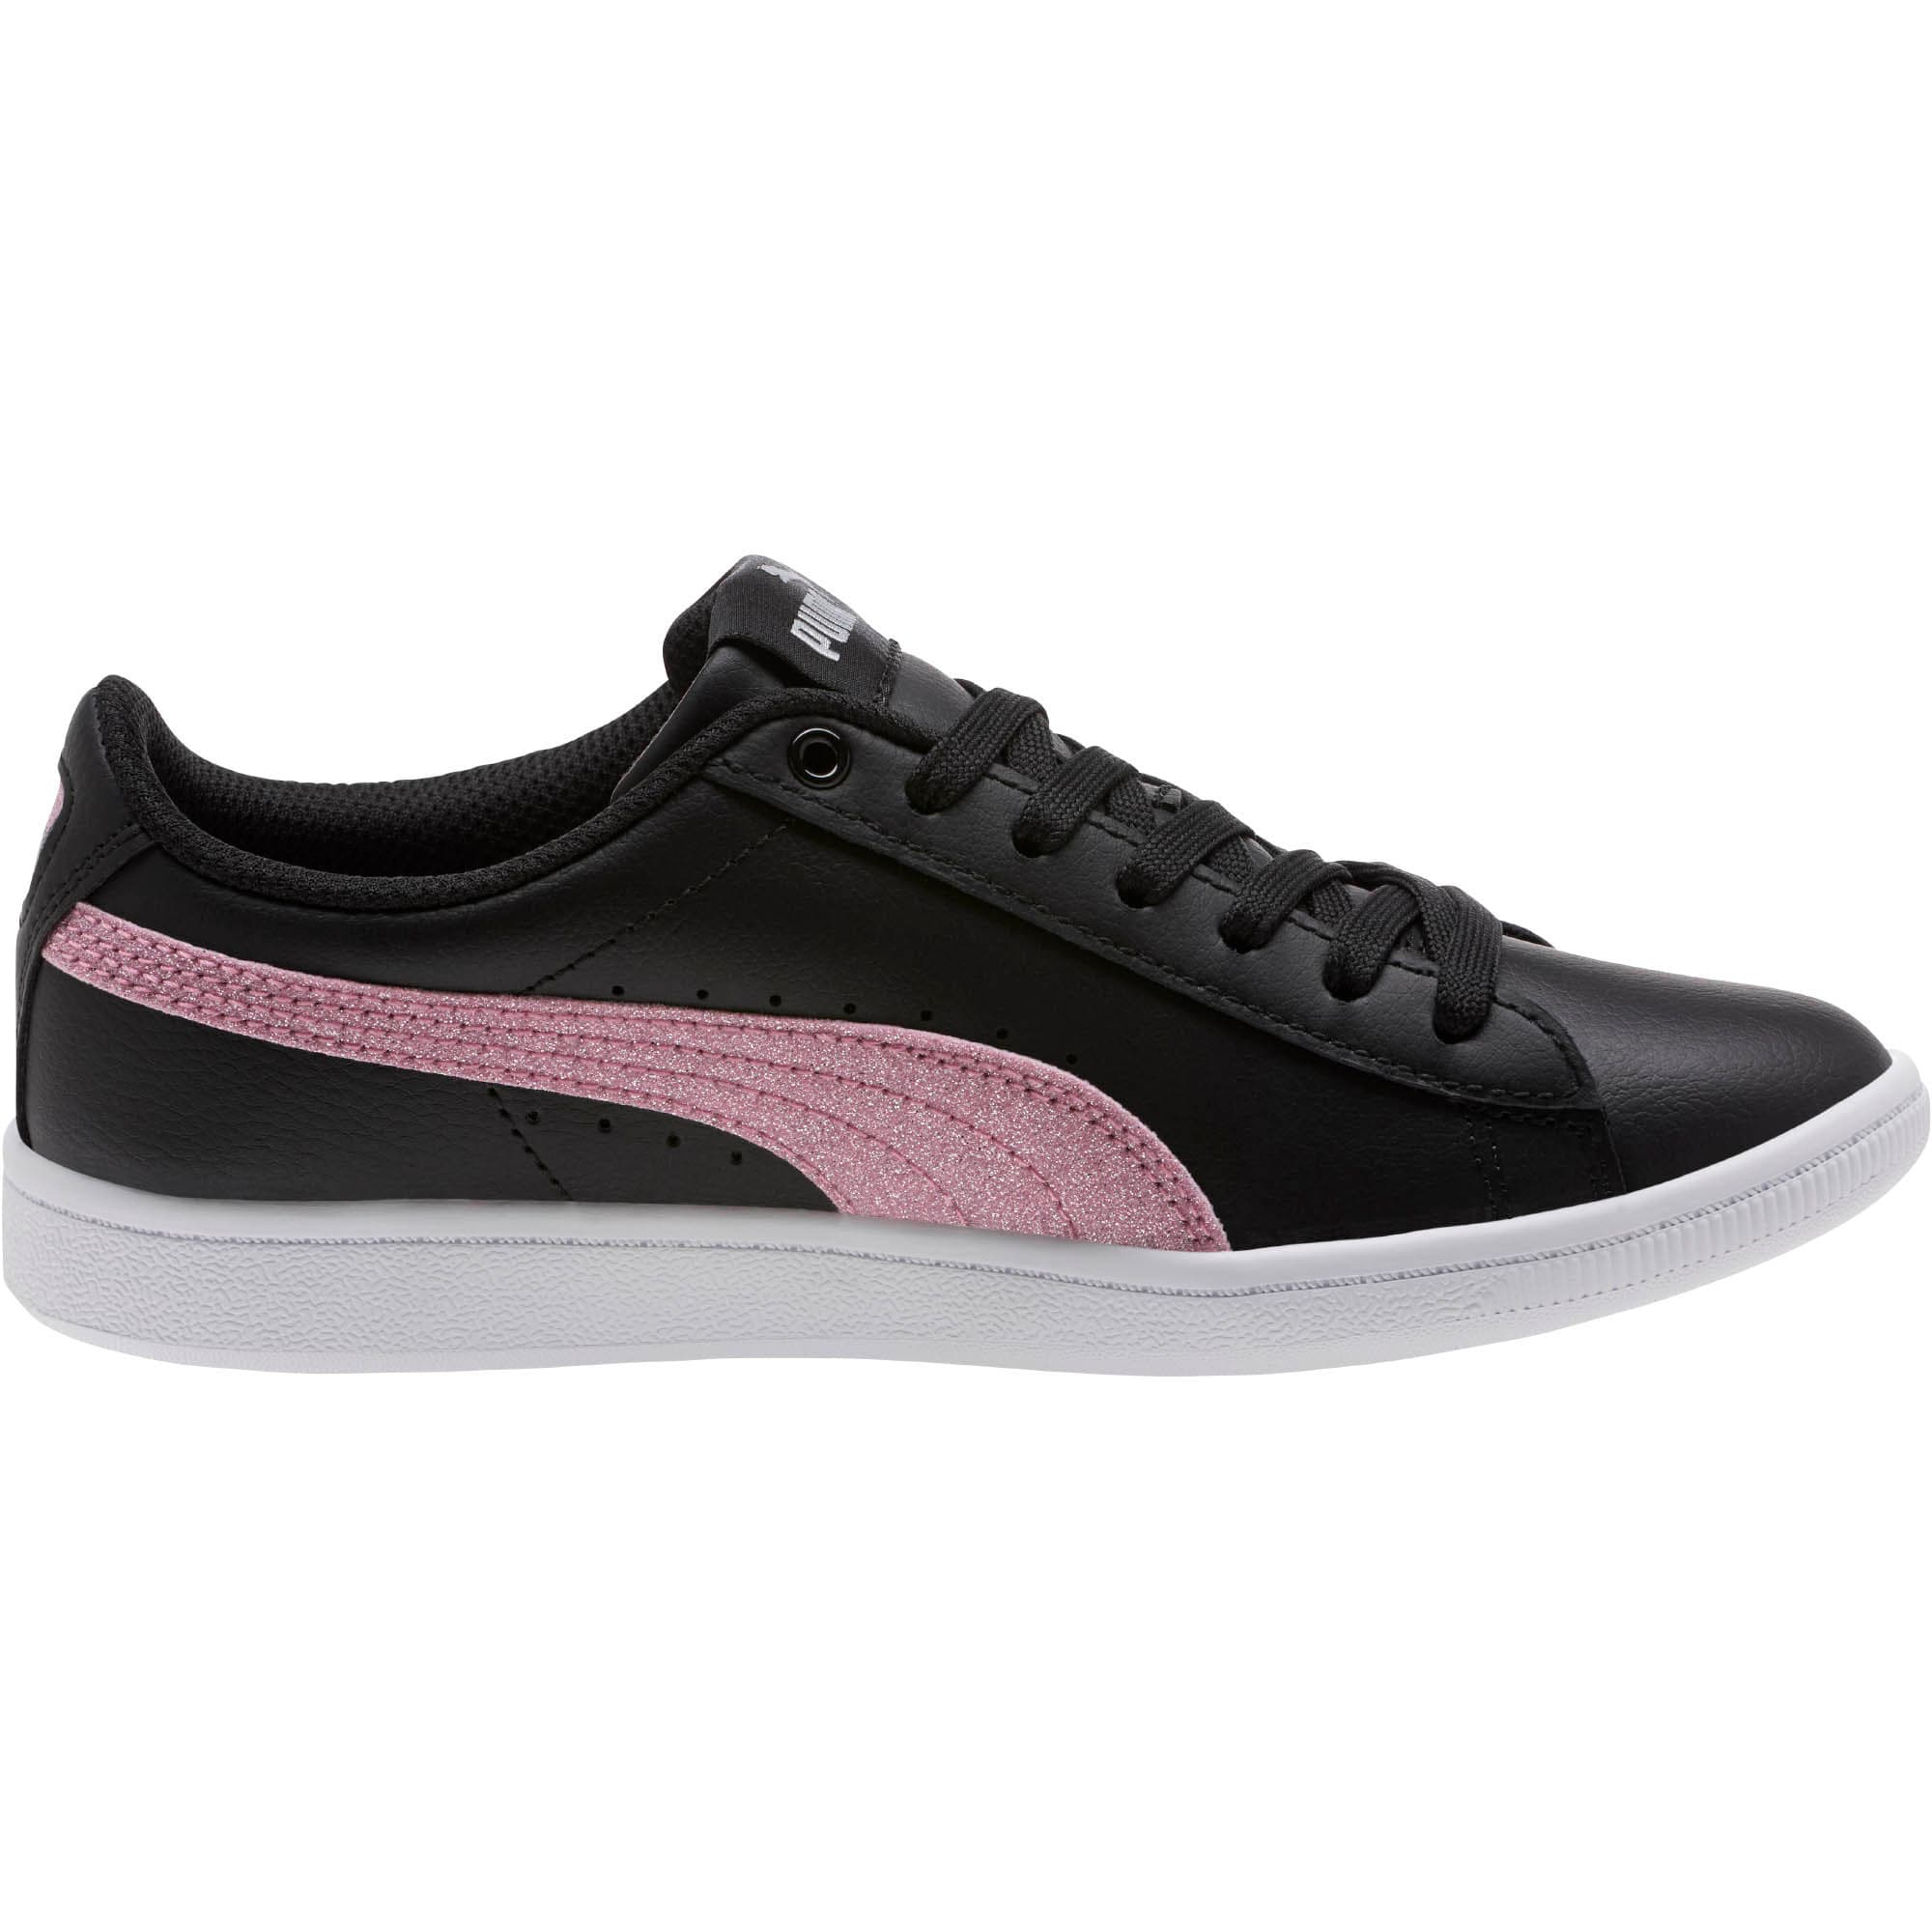 Thumbnail 3 of Puma Vikky Glitz FS Sneakers JR, Black-Orchid-Silver, medium